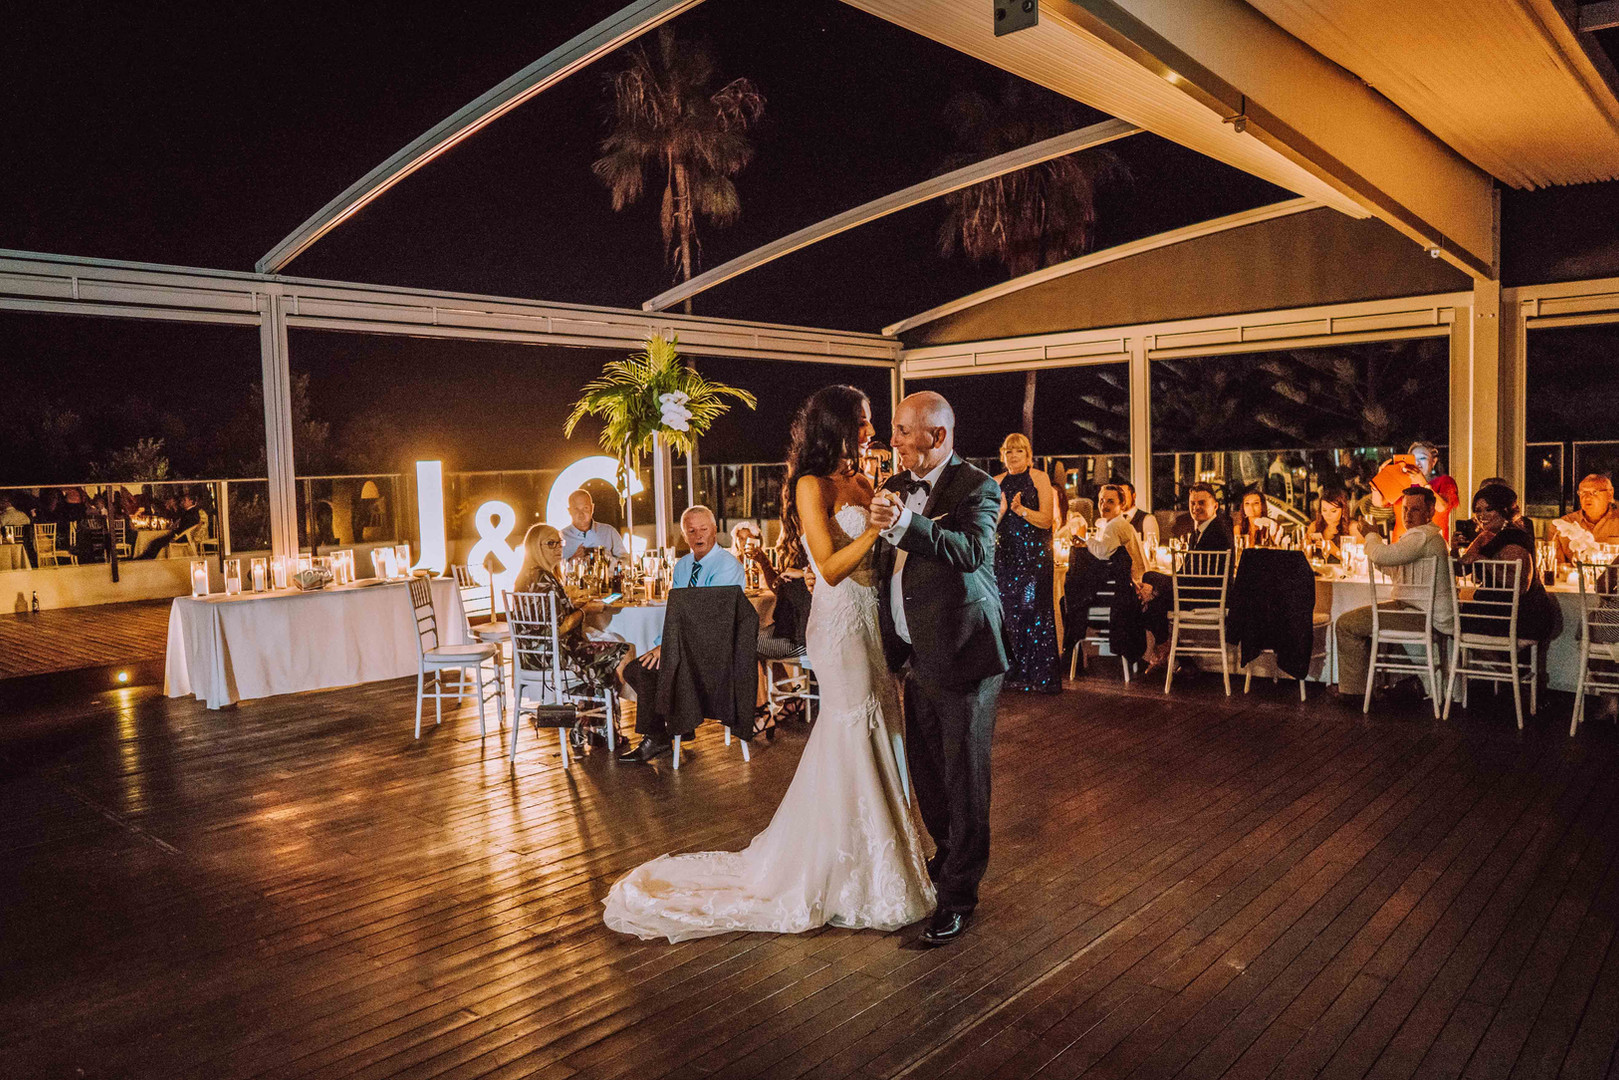 WeddingWebsite_Compressed_A8-3.jpg